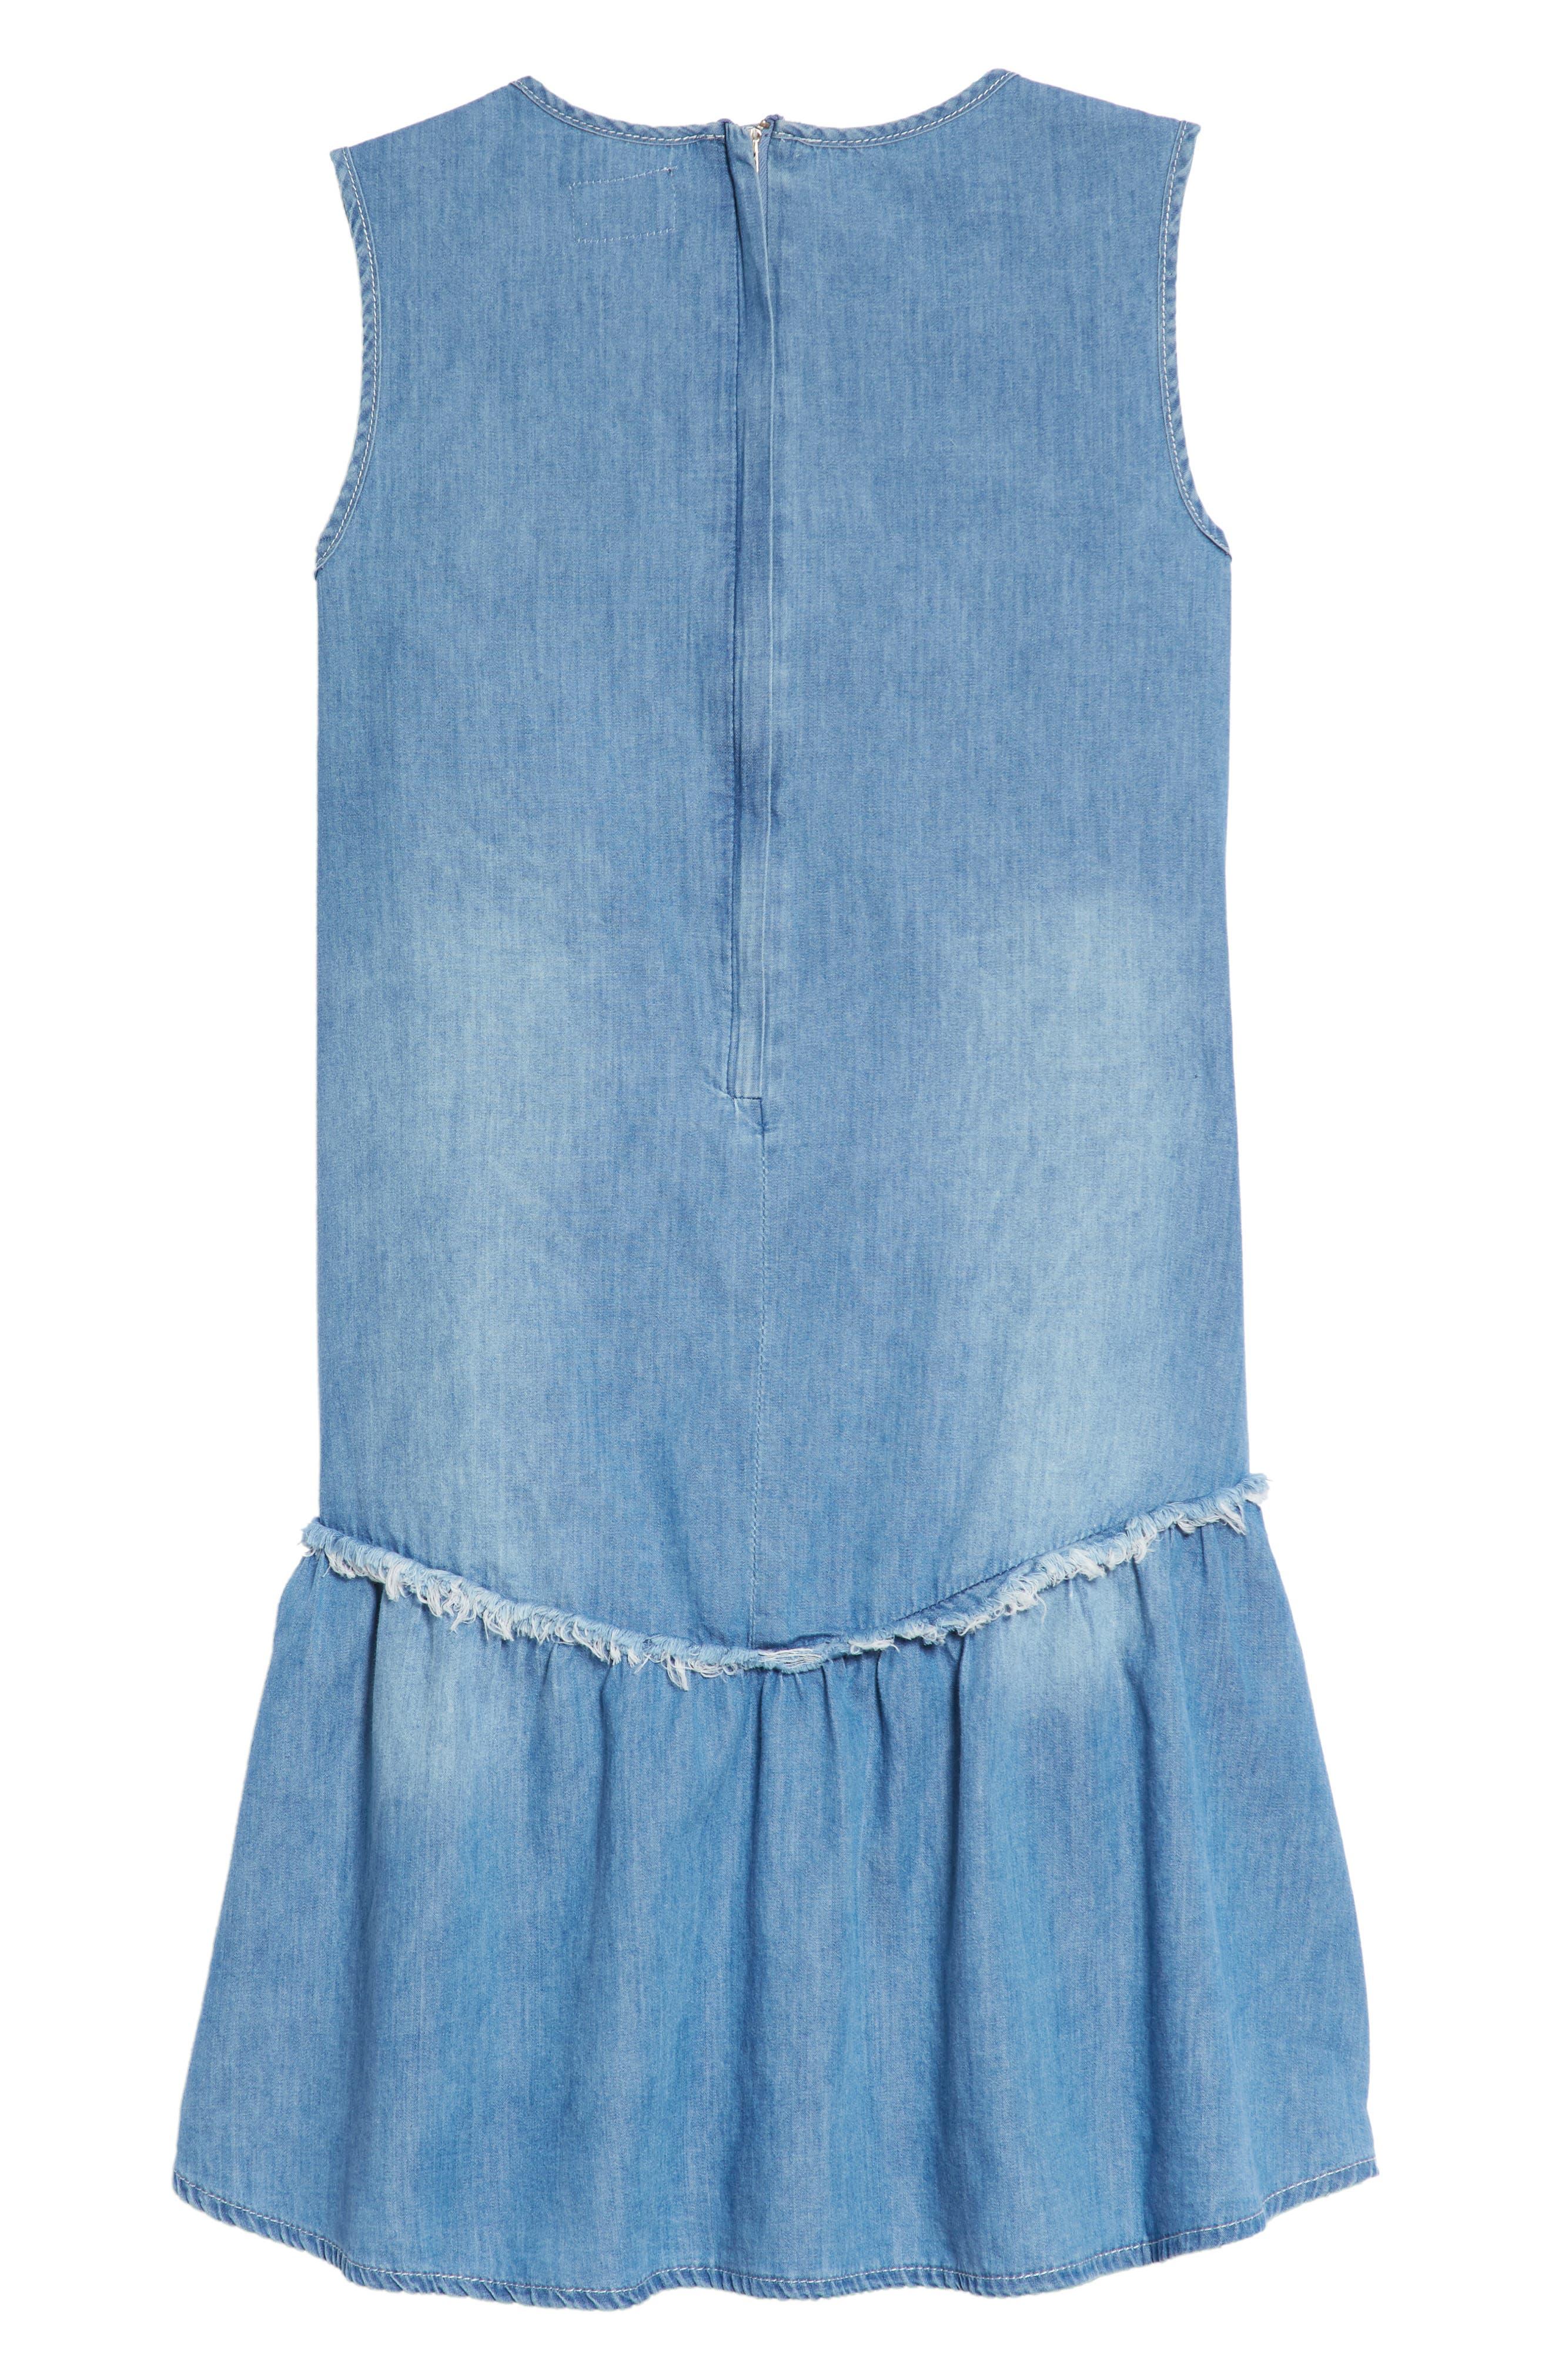 Lulu Lace-Up Chambray Dress,                             Alternate thumbnail 2, color,                             Light Blue